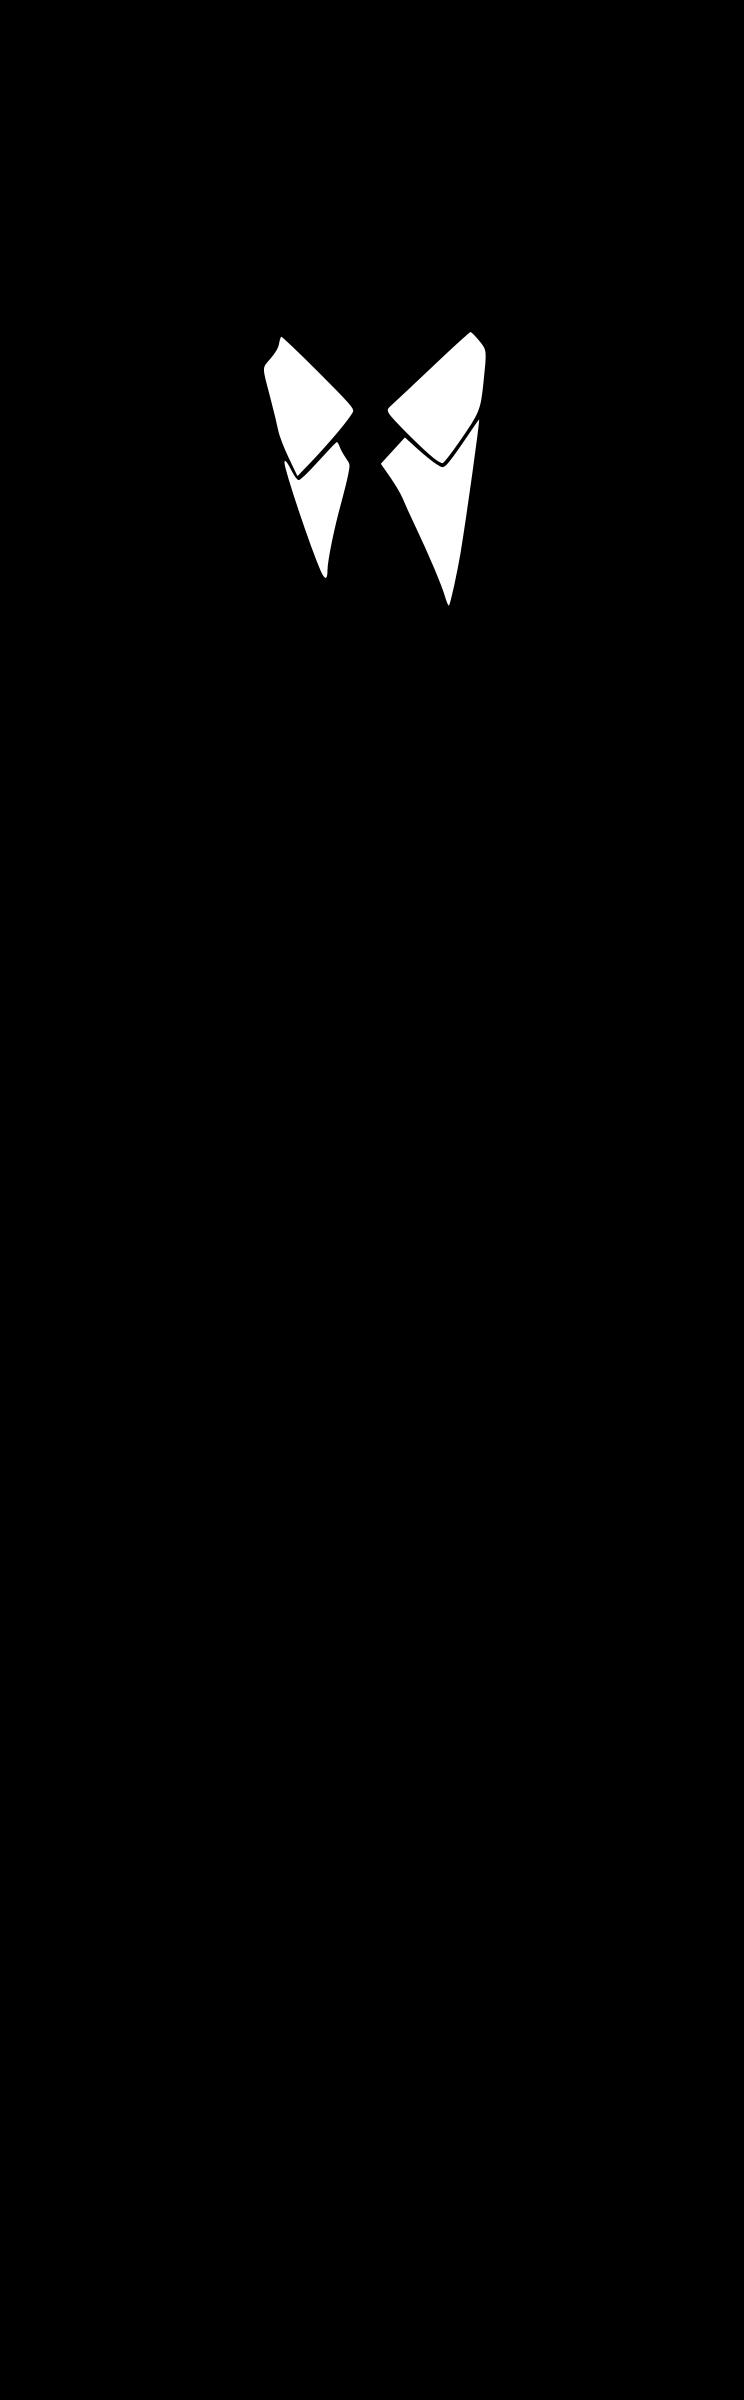 744x2400 Clipart